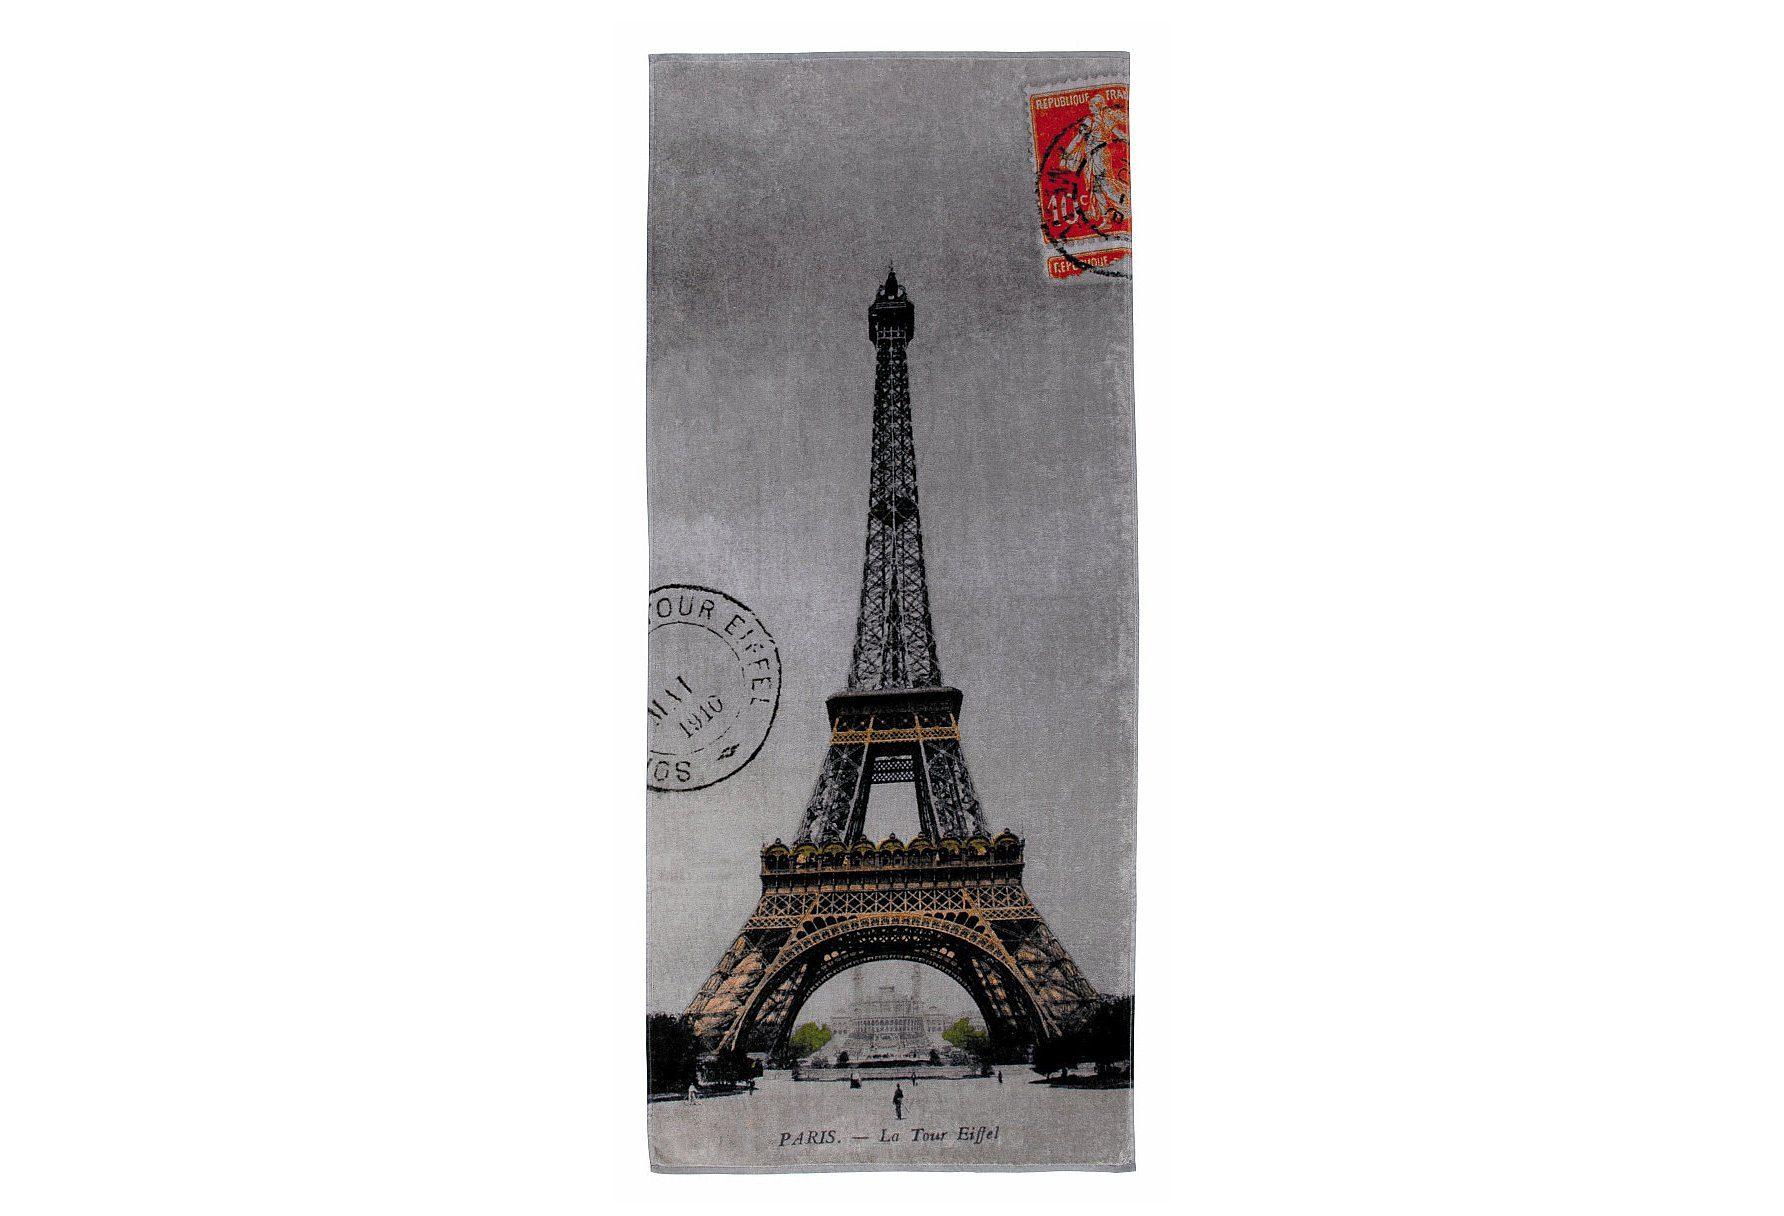 Strandtuch, Möve, »Eiffelturm«, in Postkarten-Optik